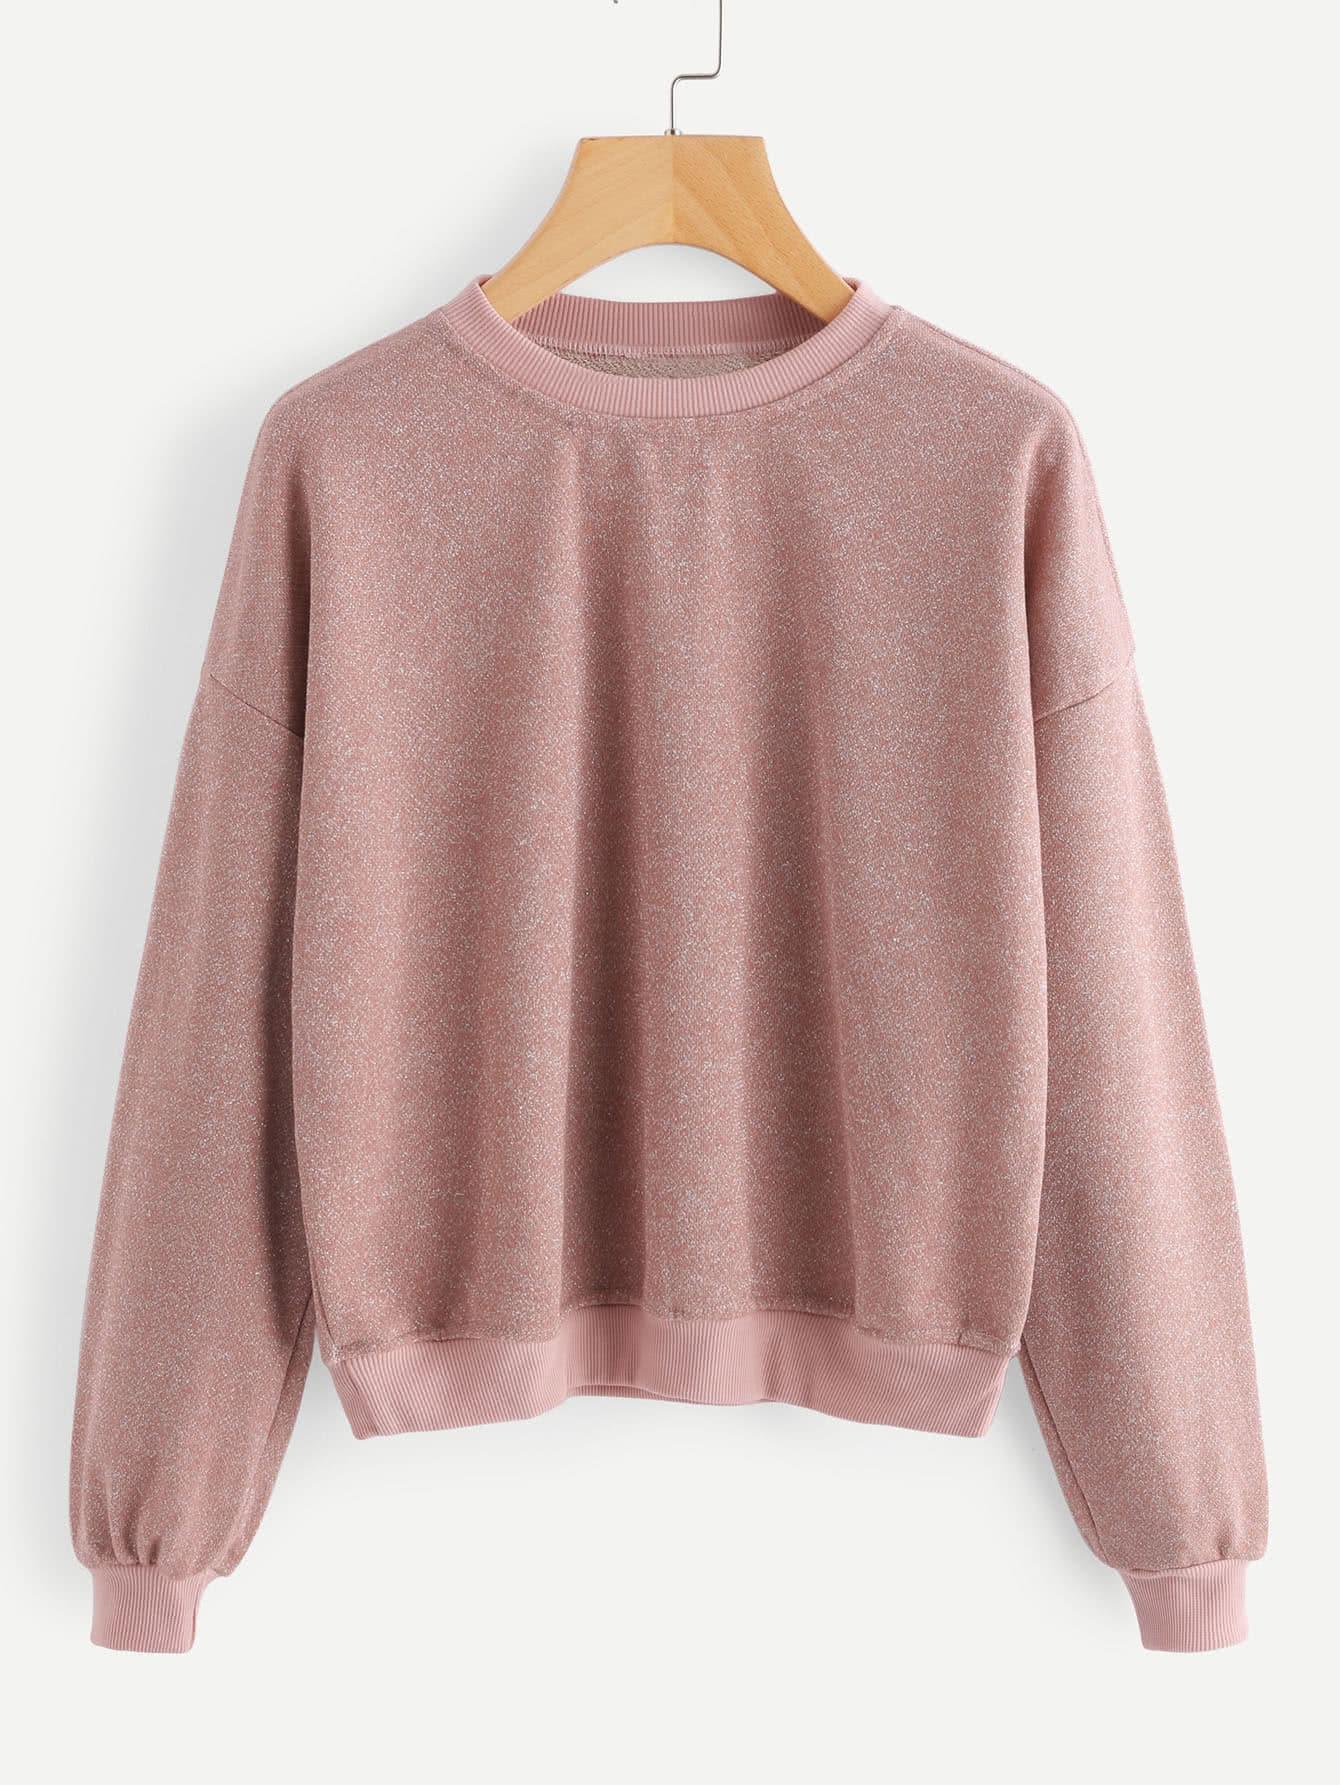 Ribbed Trim Drop Shoulder Sparkle Sweatshirt sweatshirt170817104